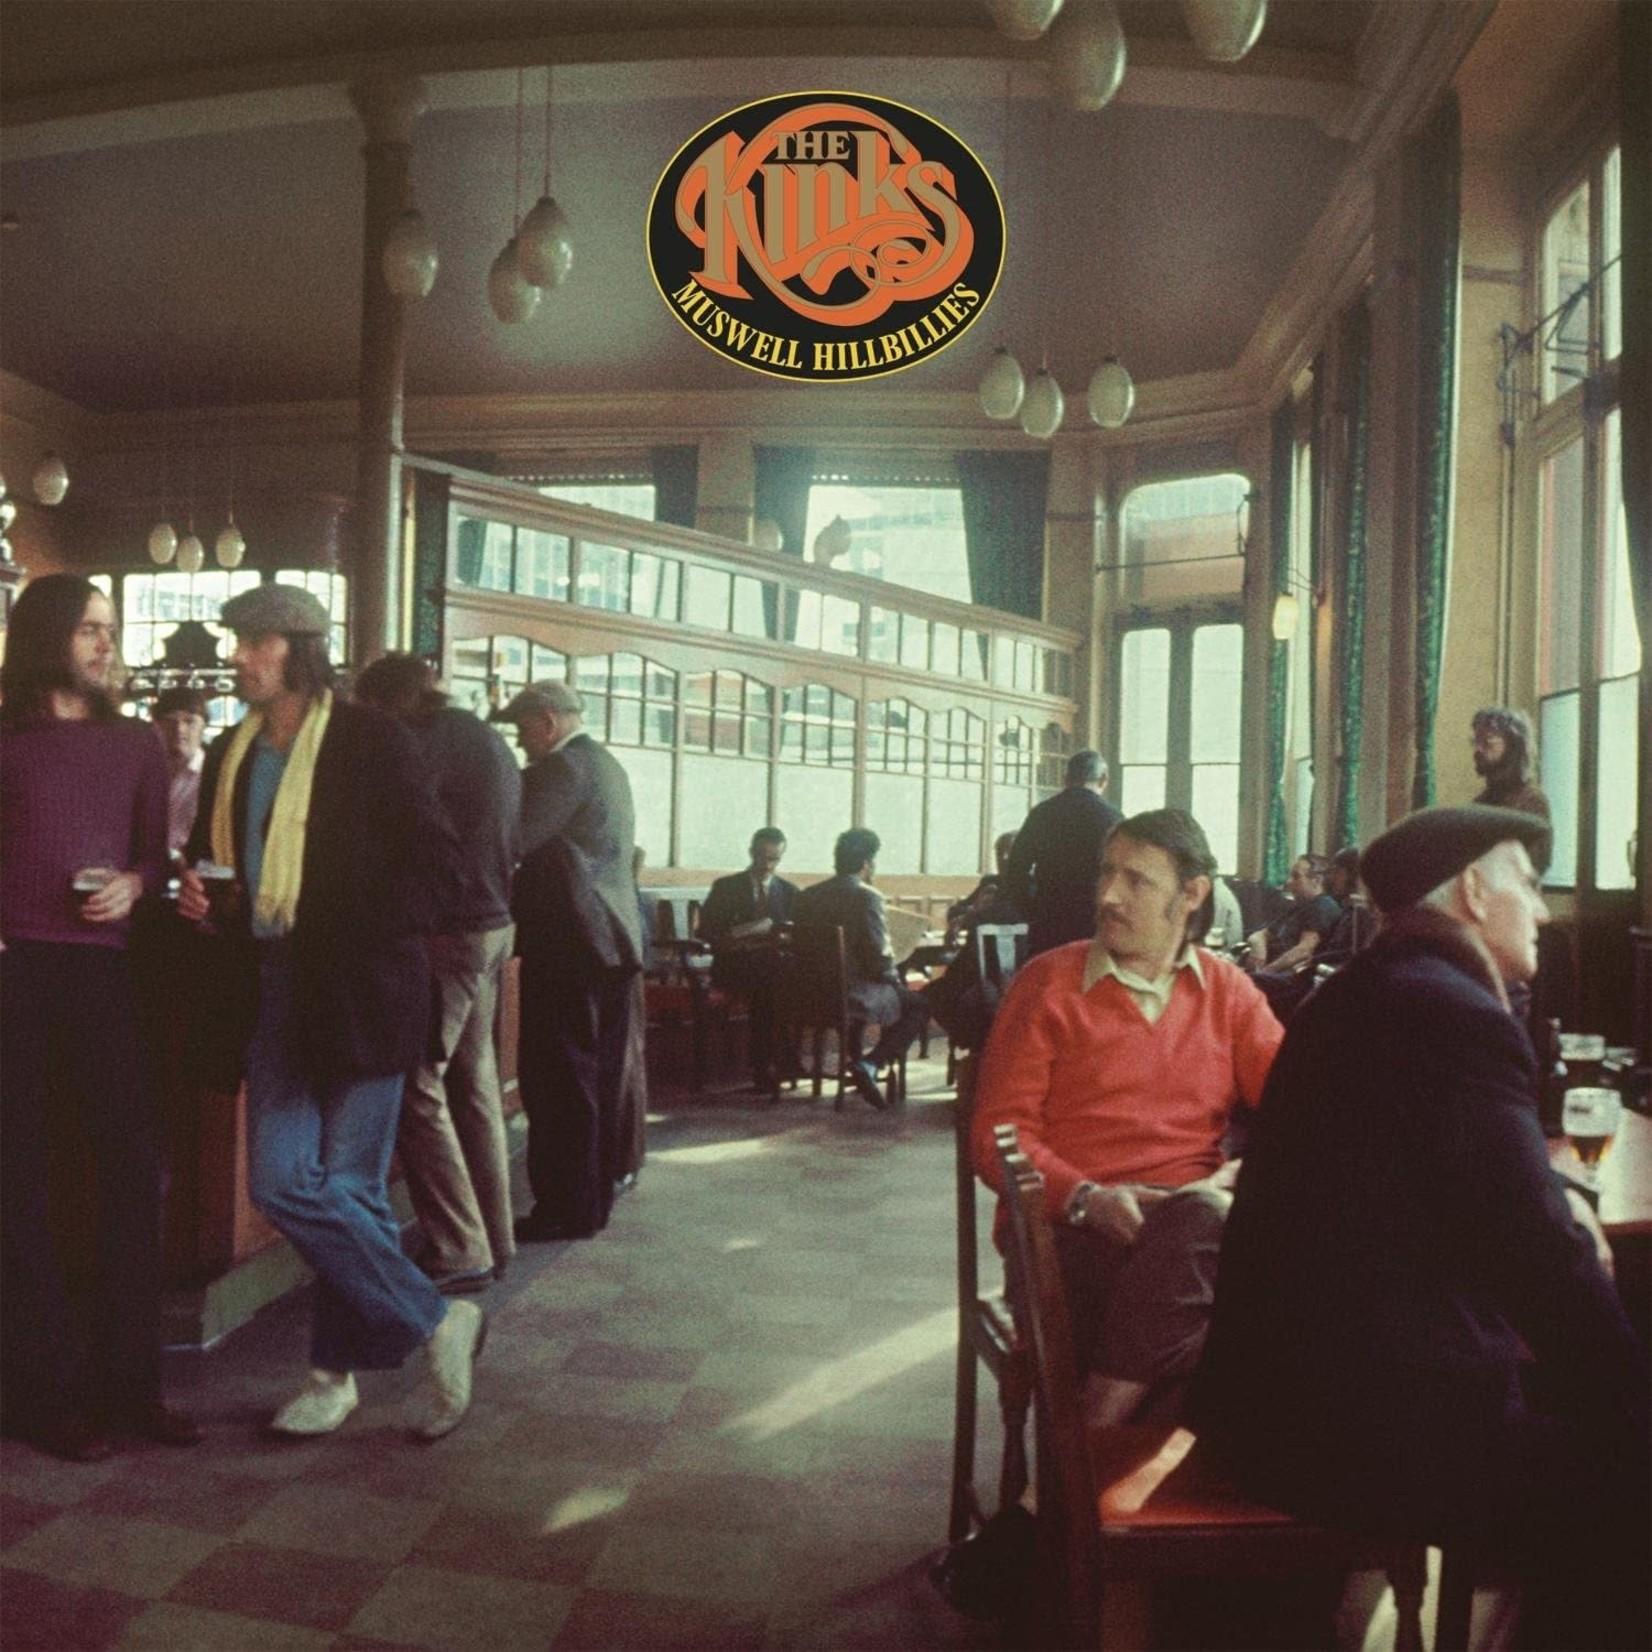 [New] Kinks: Muswell Hillbillies (2LP)